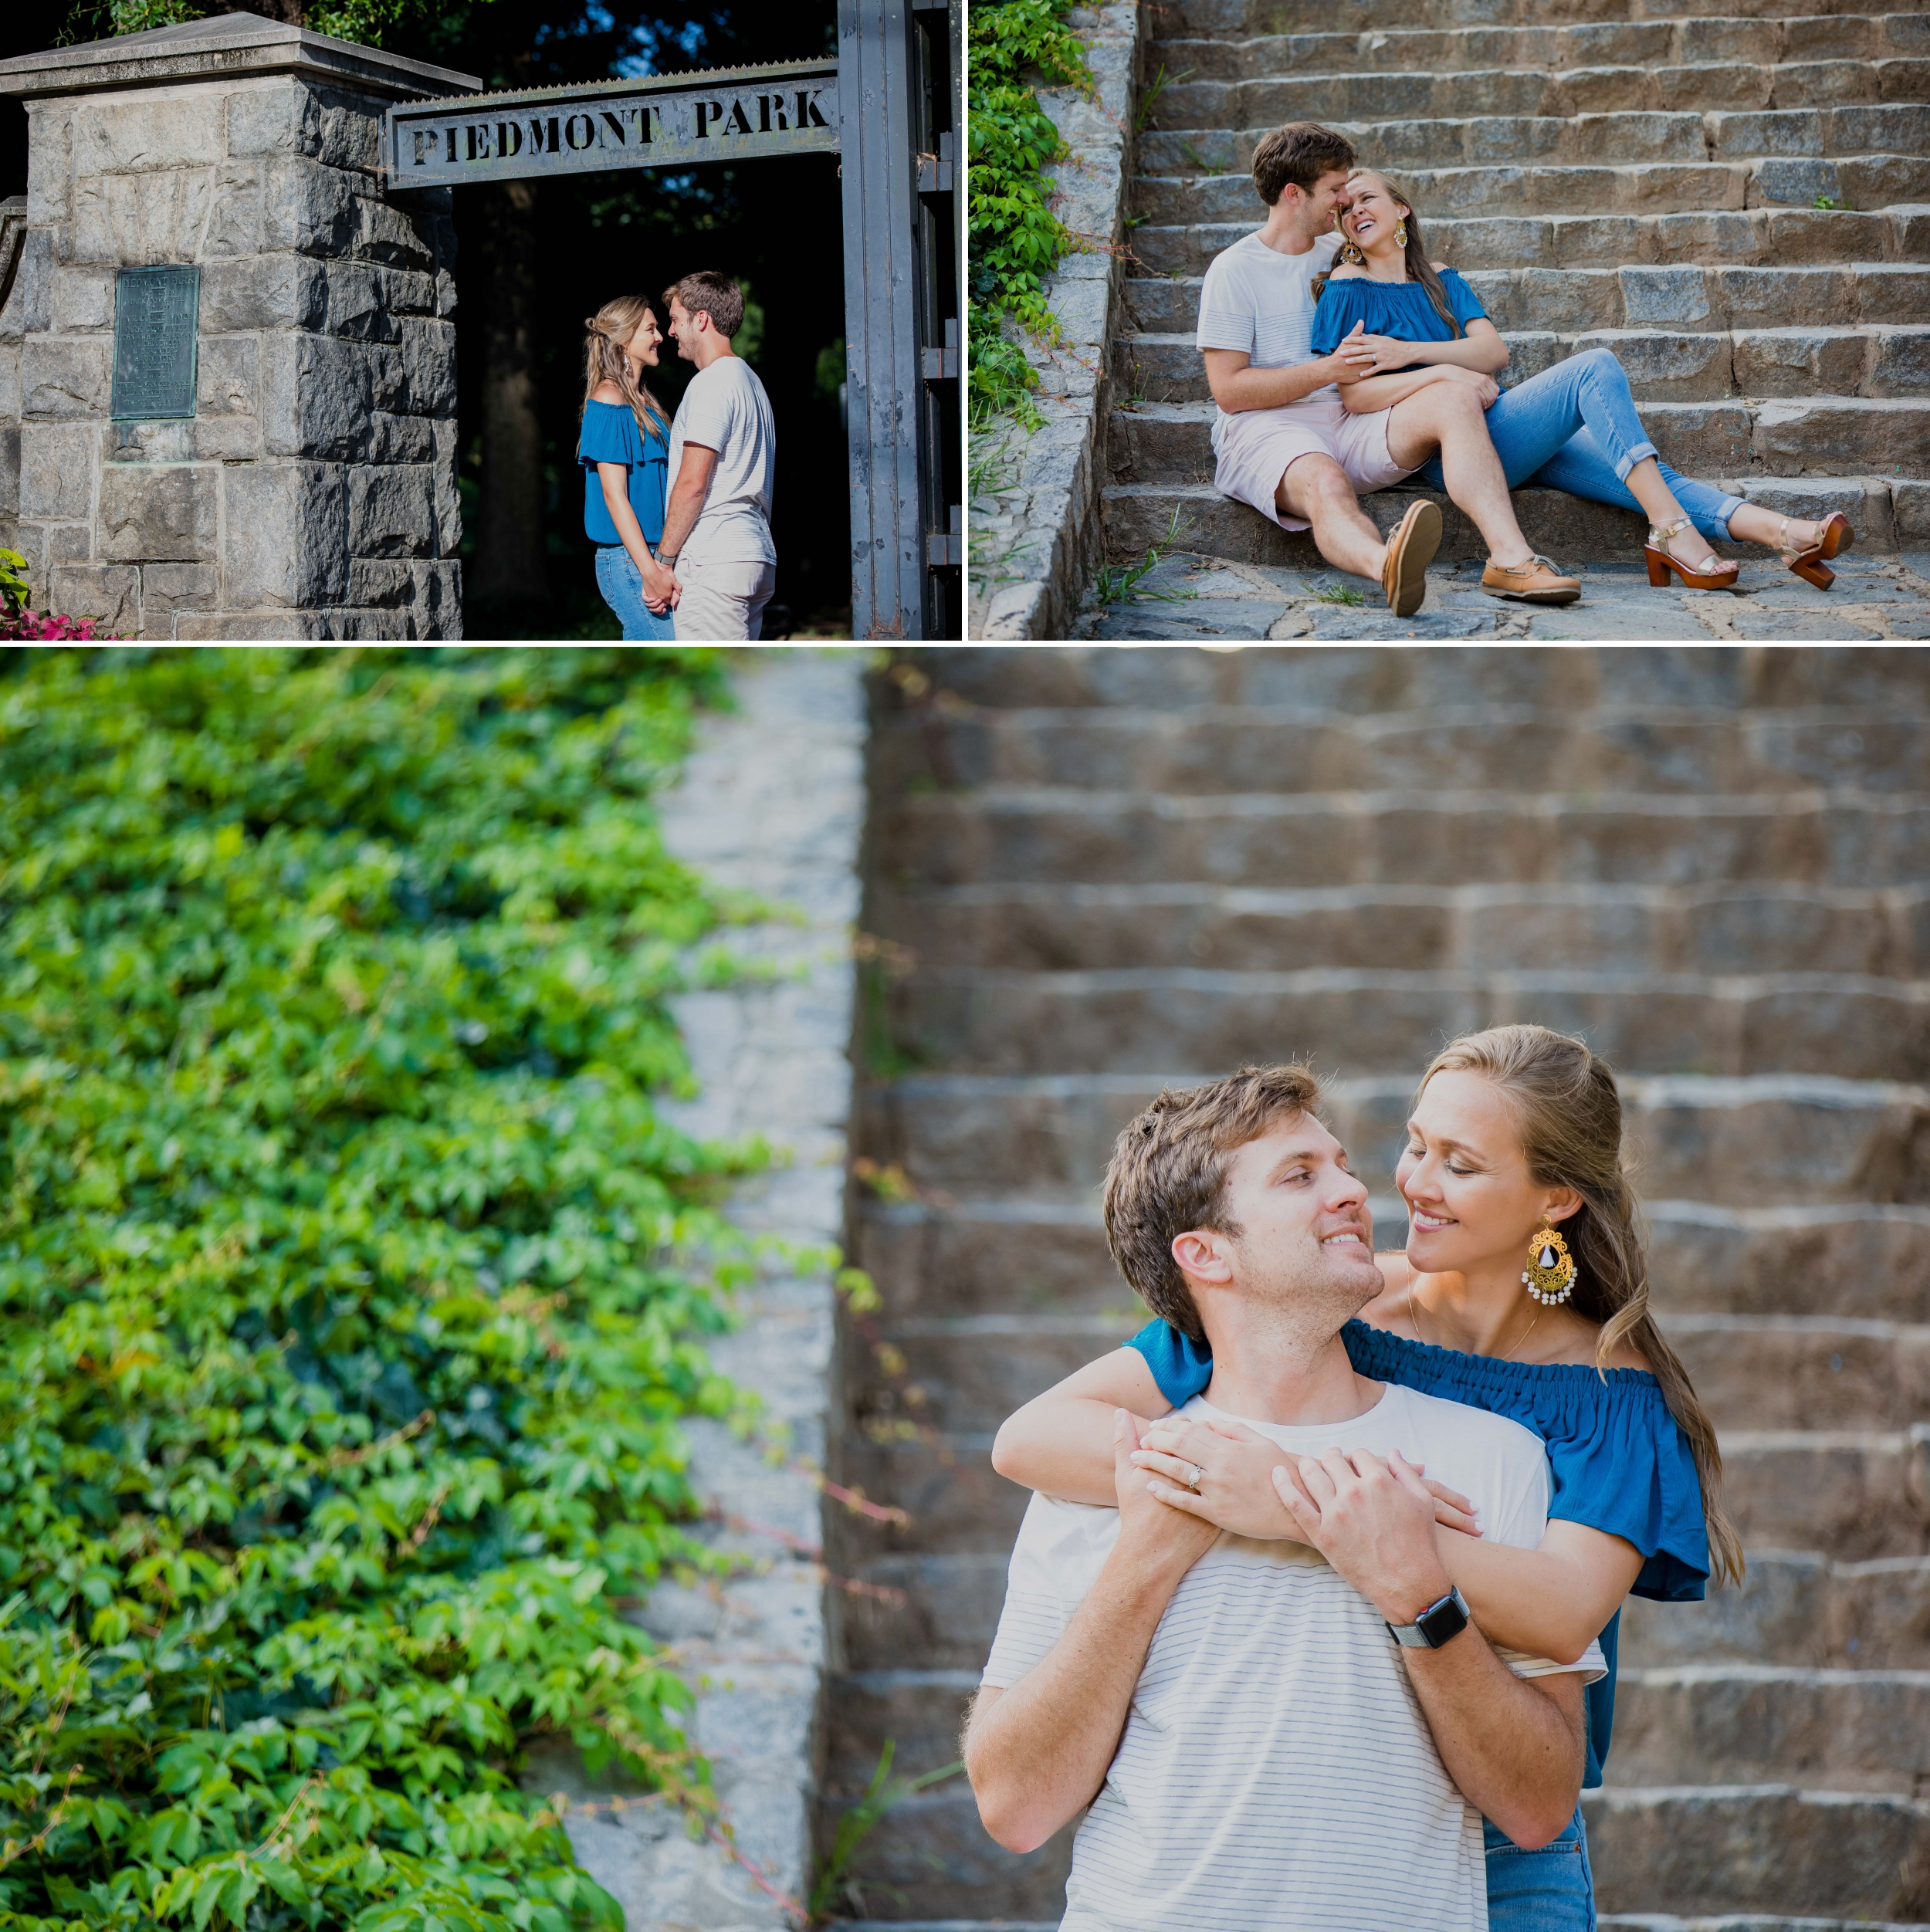 Engagement Session - Piedmont Park - Atlanta - GA - Santy Martinez Photography 5.jpg